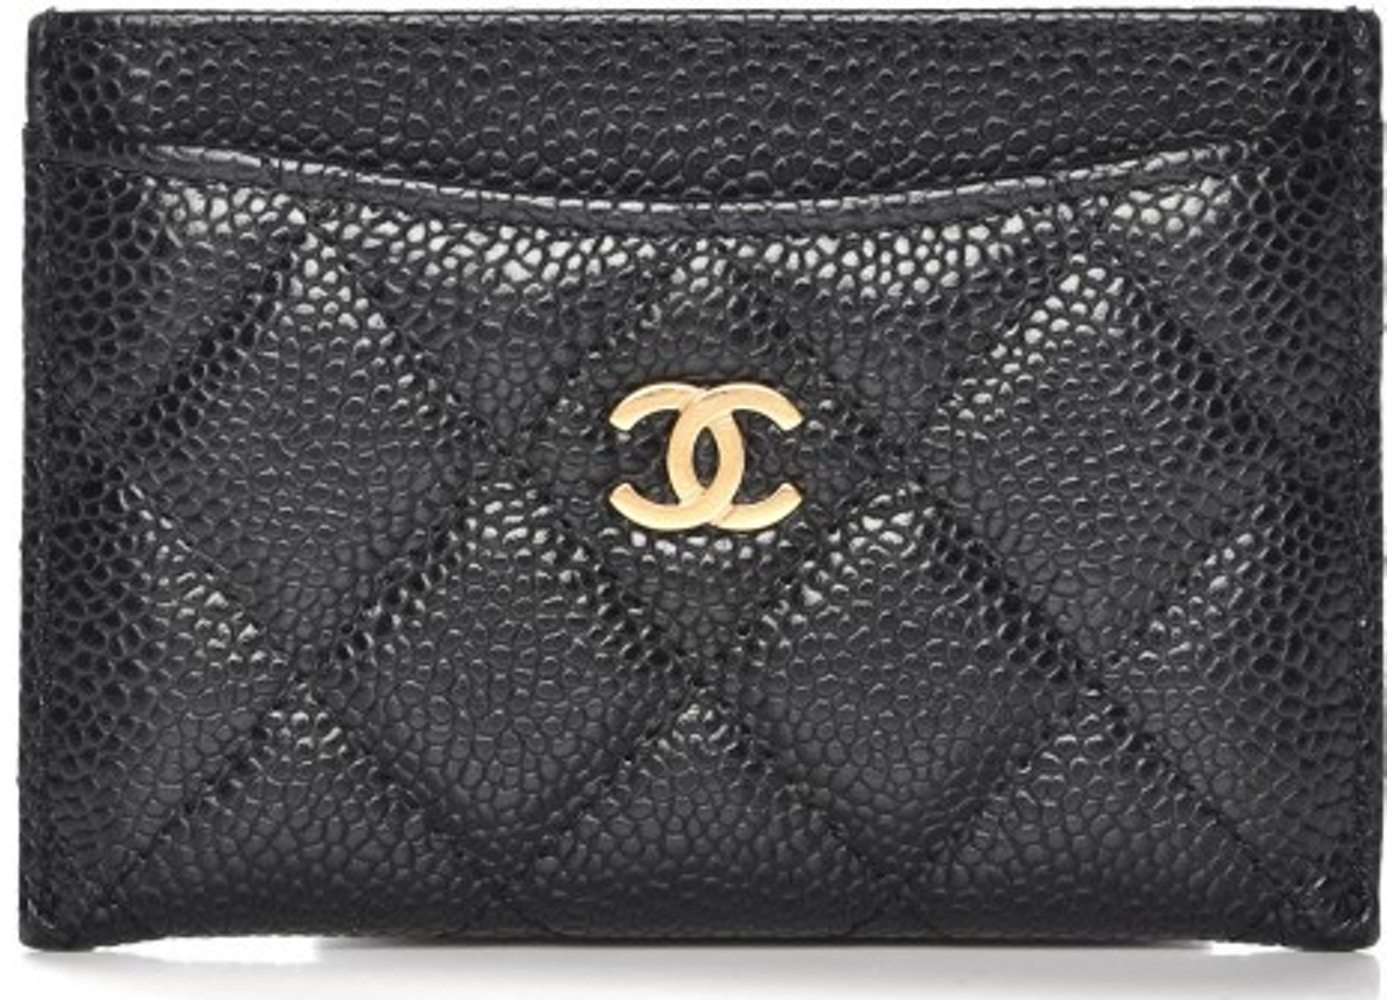 44f0c1a804ee Buy & Sell Chanel Handbags - New Highest Bids